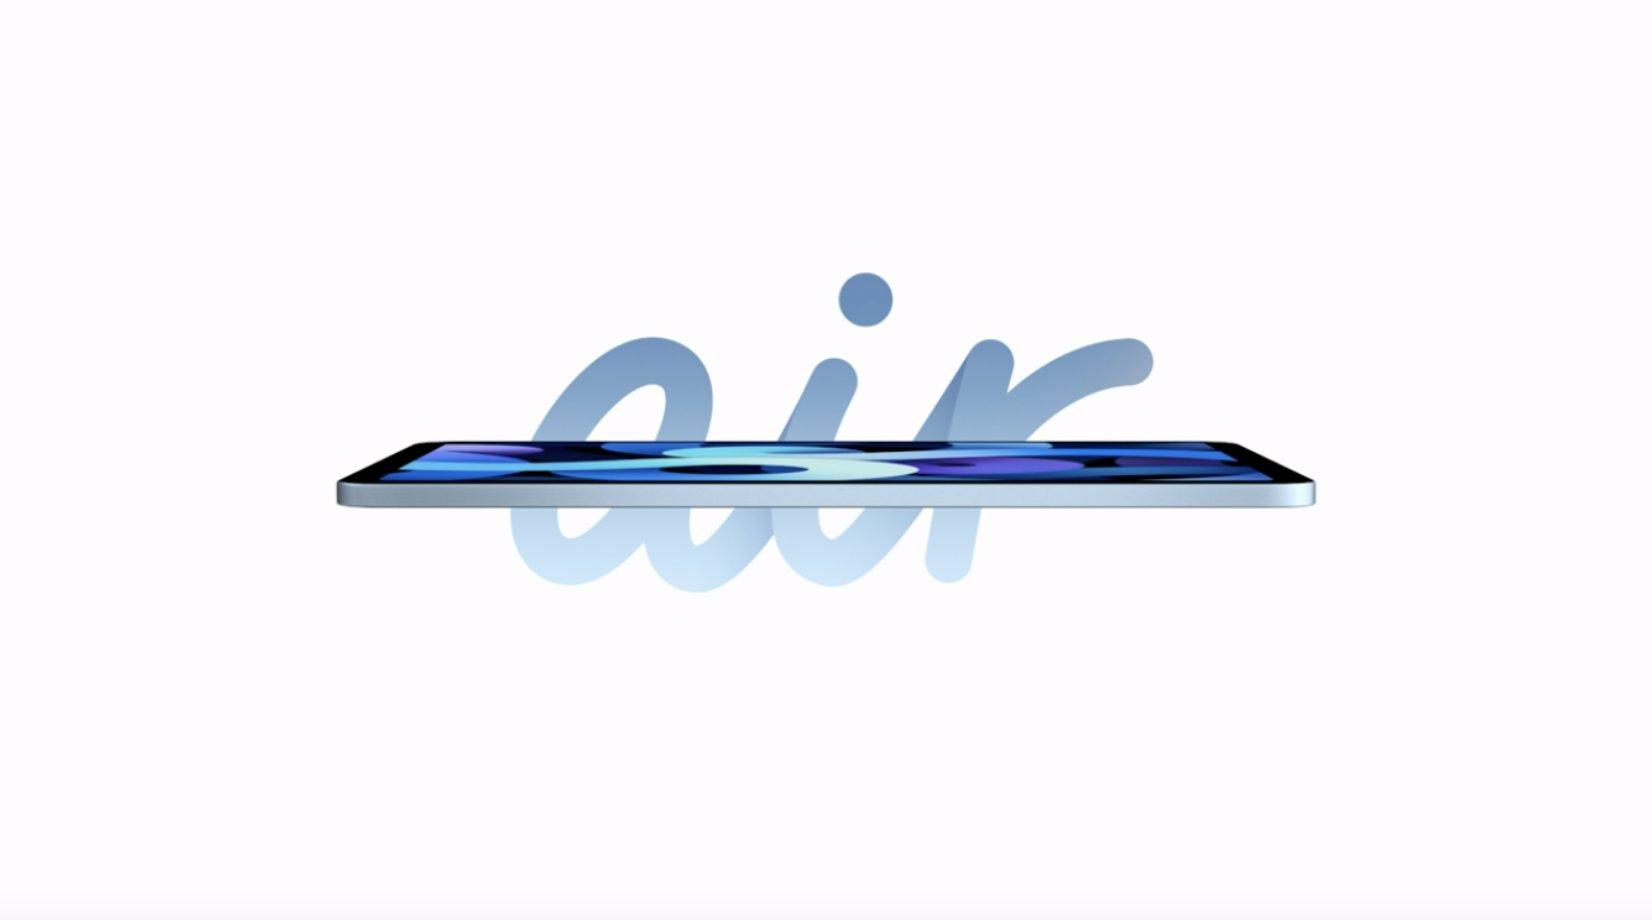 Apple iPad Air 10.2-inch